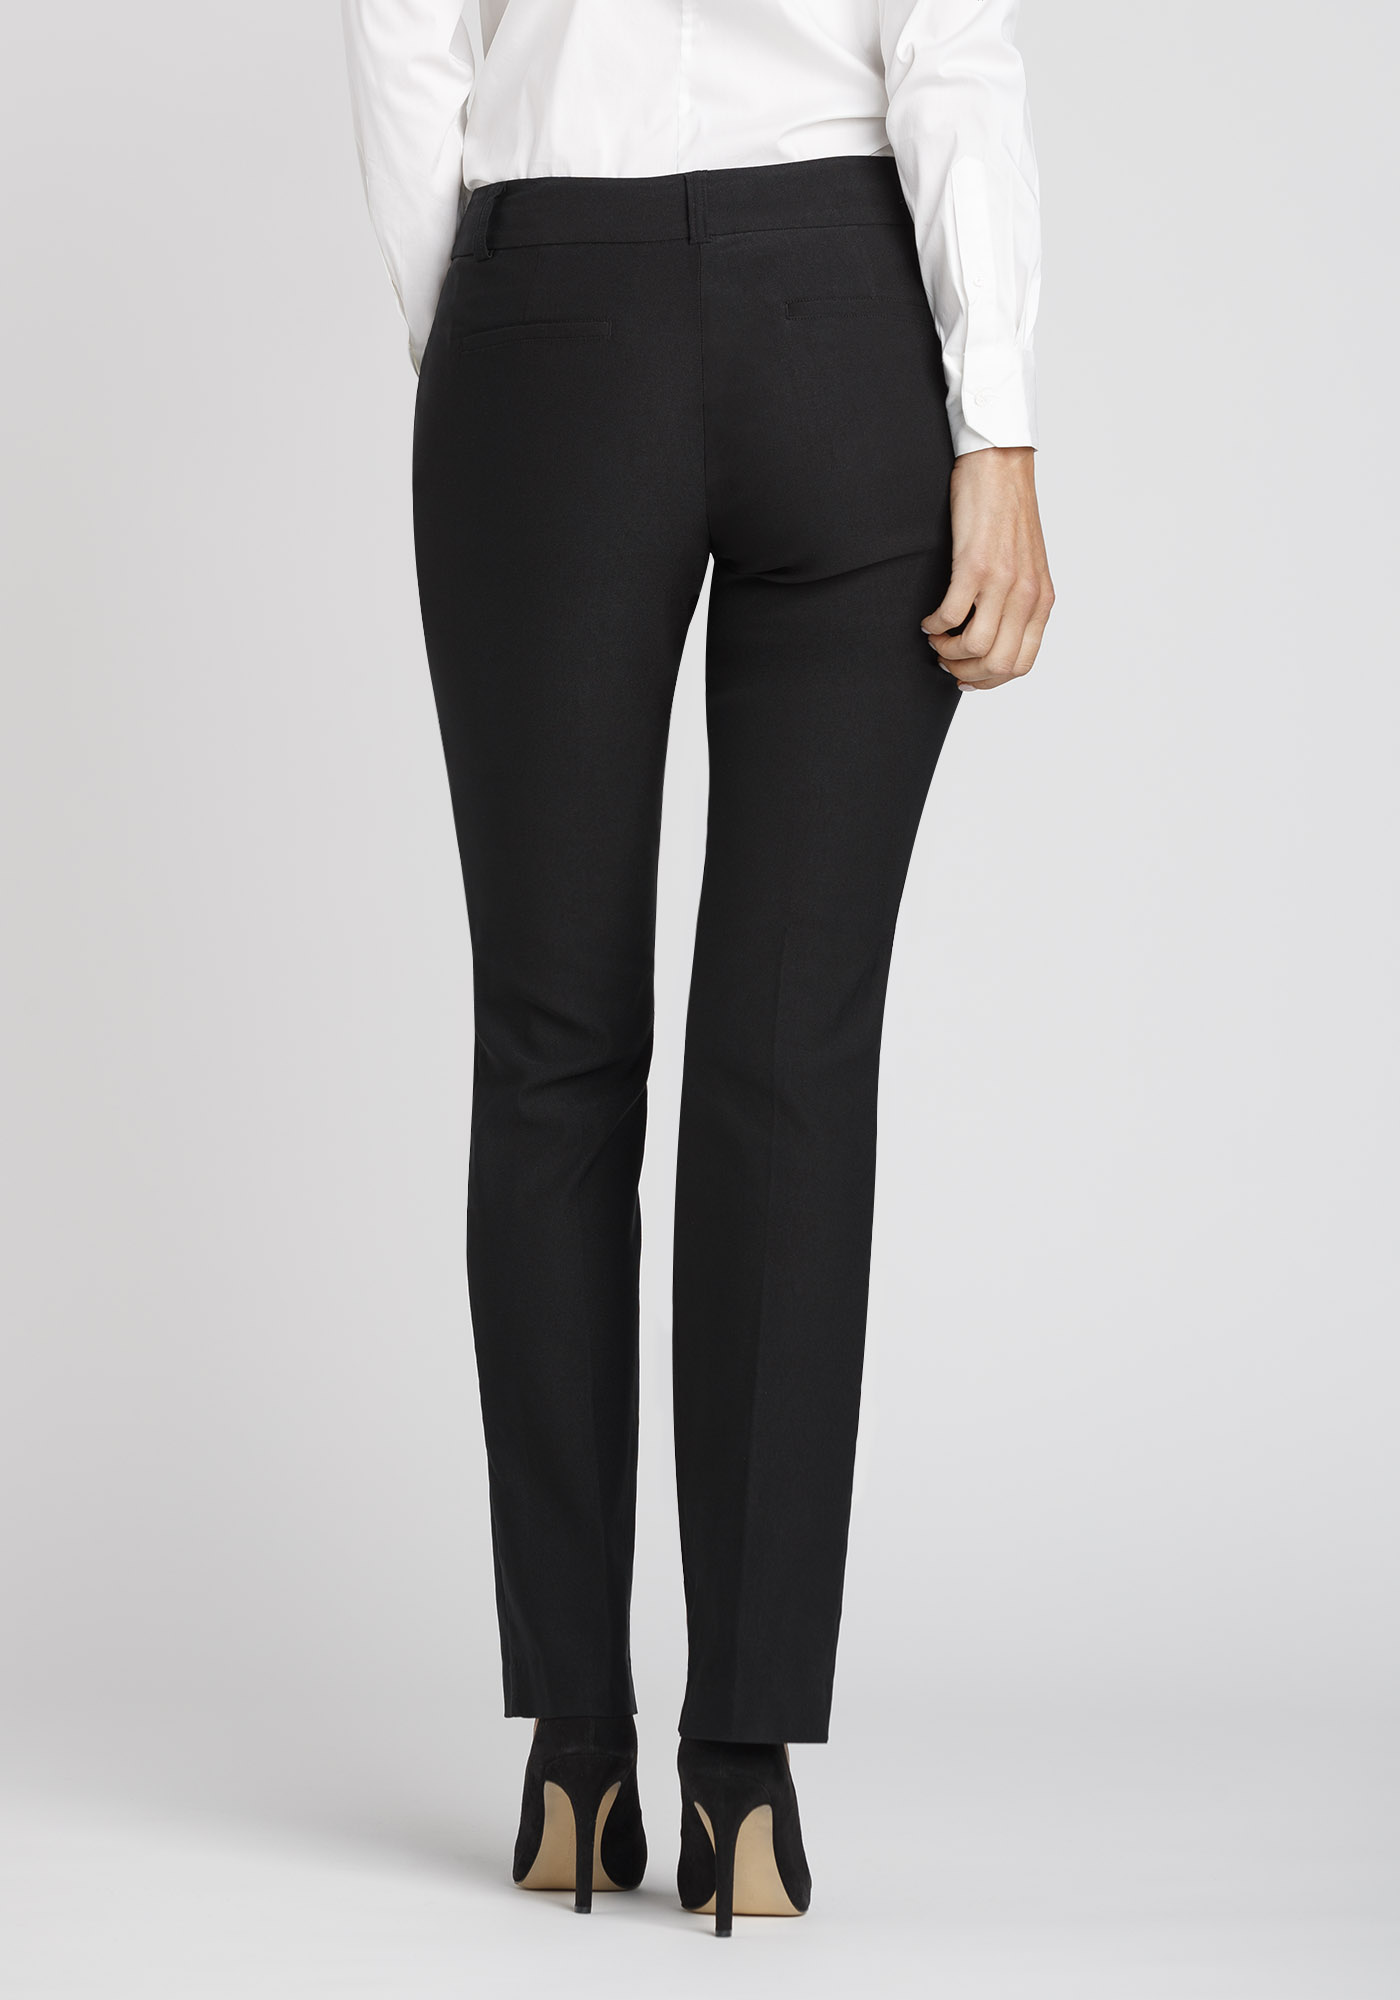 cad1032b39167 Black Straight Dress Pants – DACC